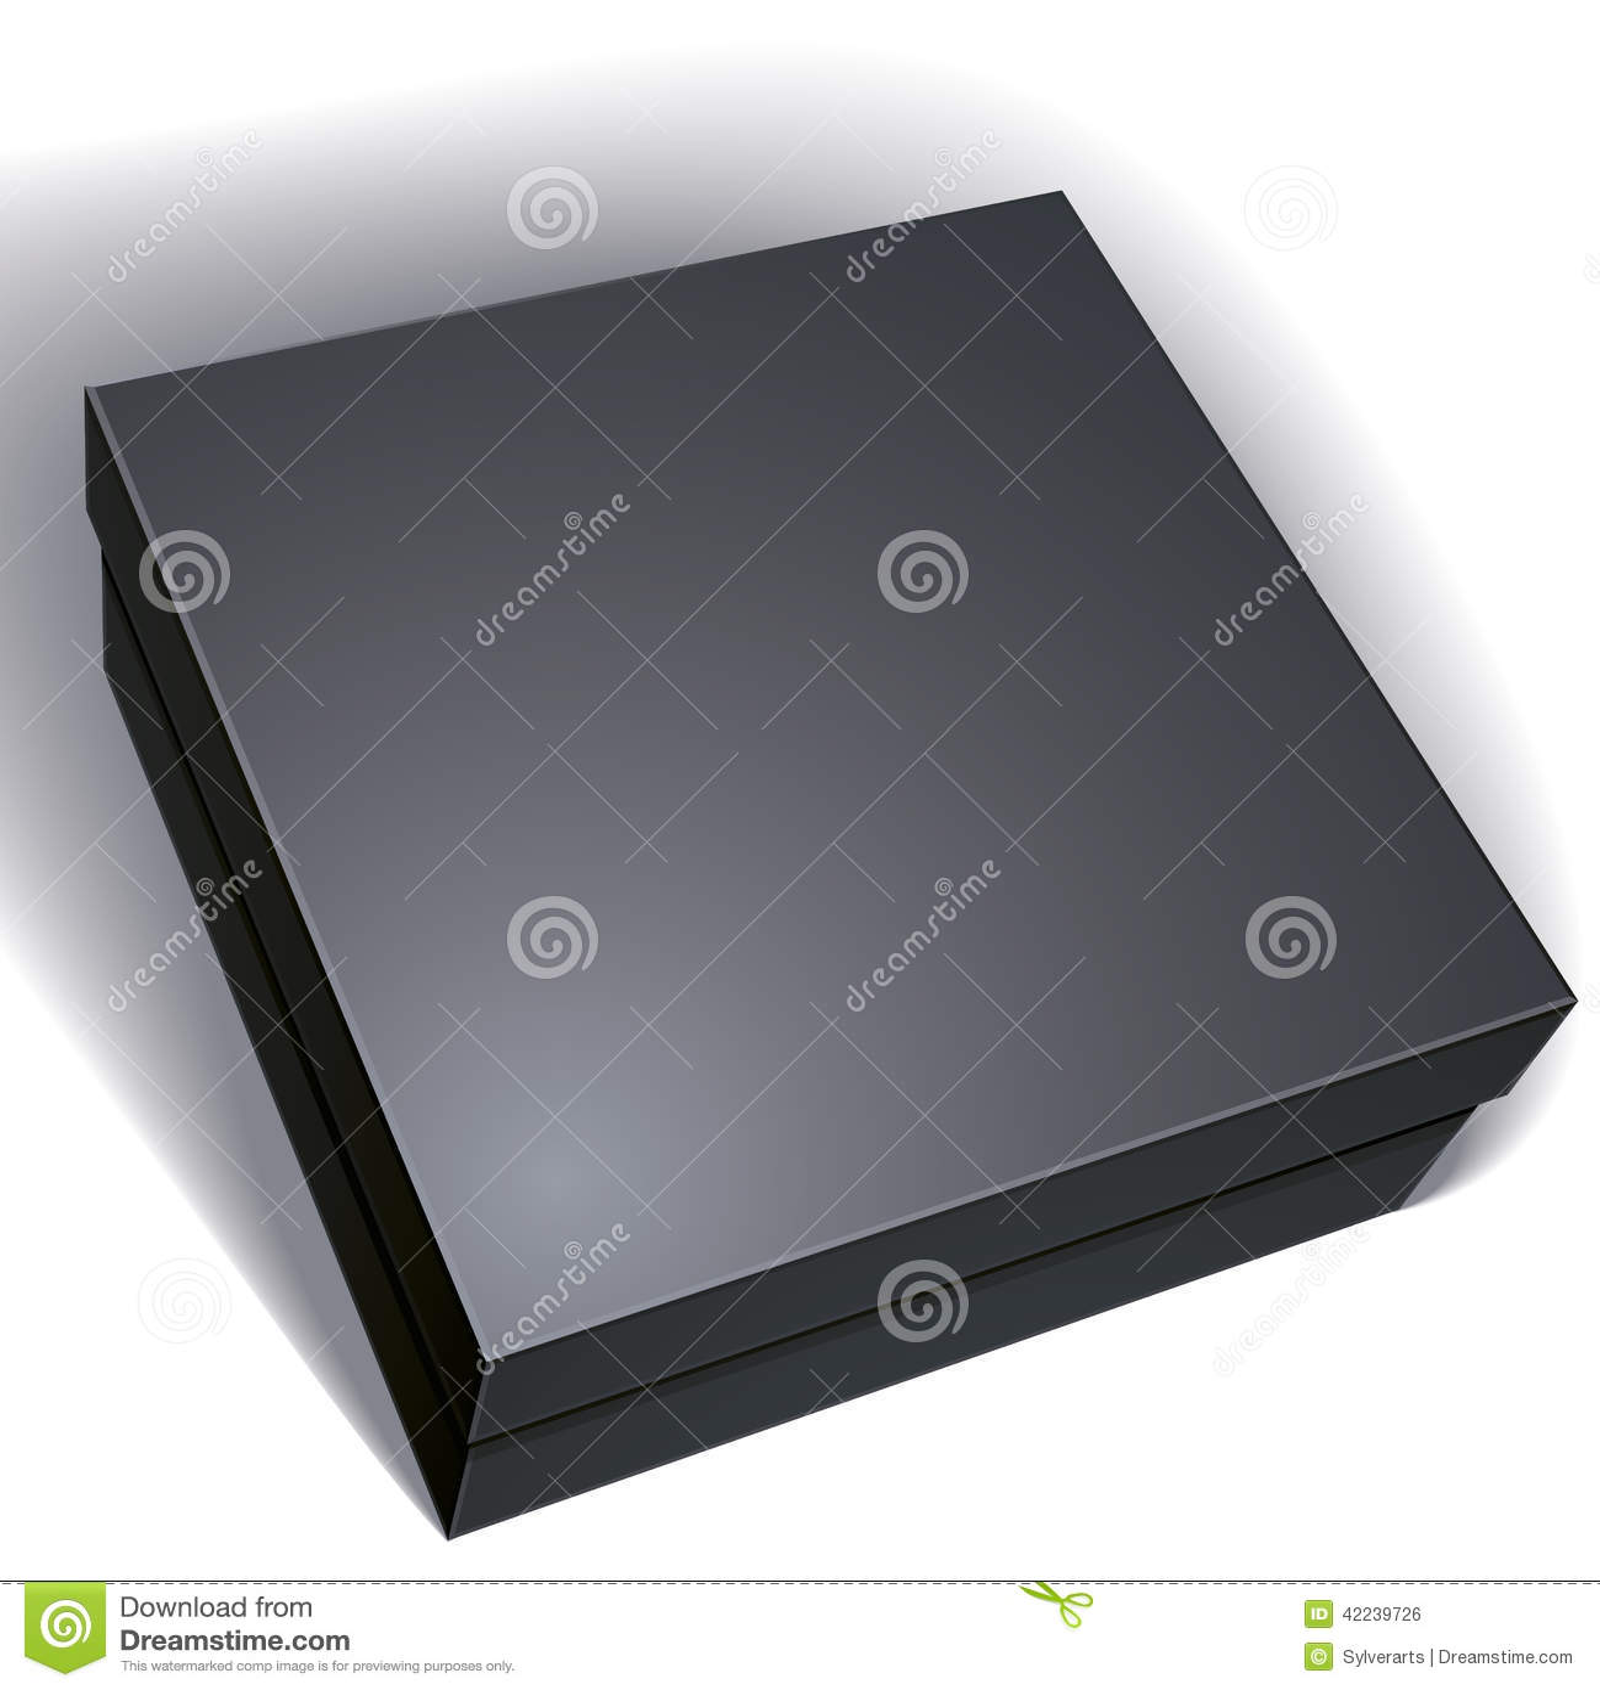 how to put a black box on a pdf